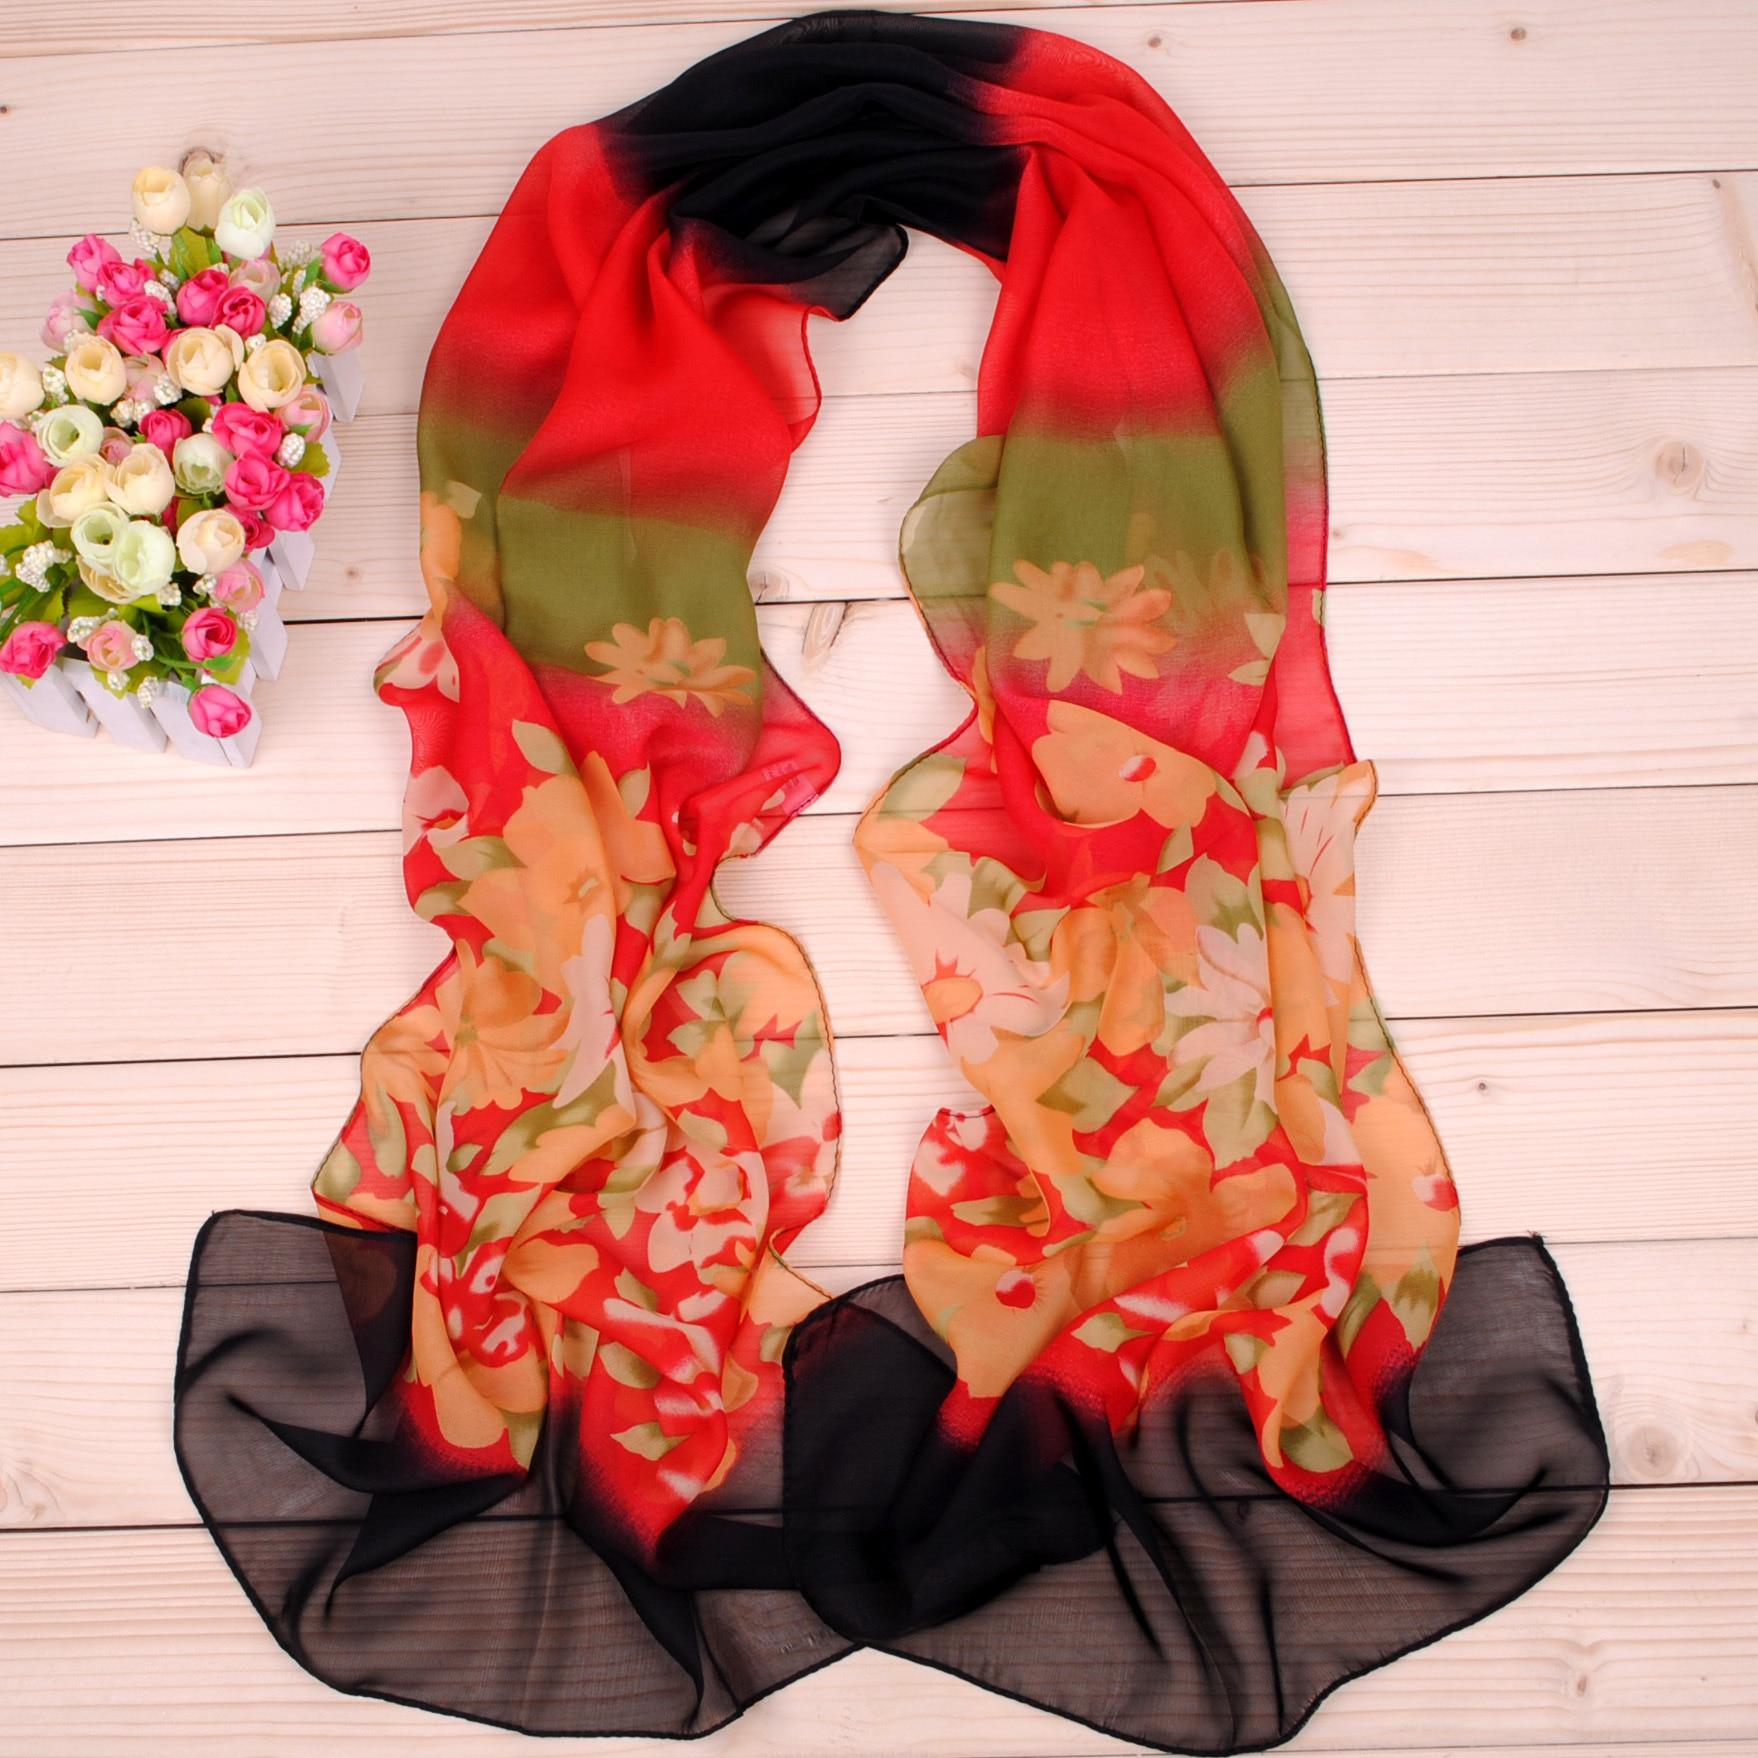 Natural Silk Scarf Women Luxury Brand 2019 Fashion Female Designer Big Florals Digital Printed Silk Foulard Ladies Silk Shawls